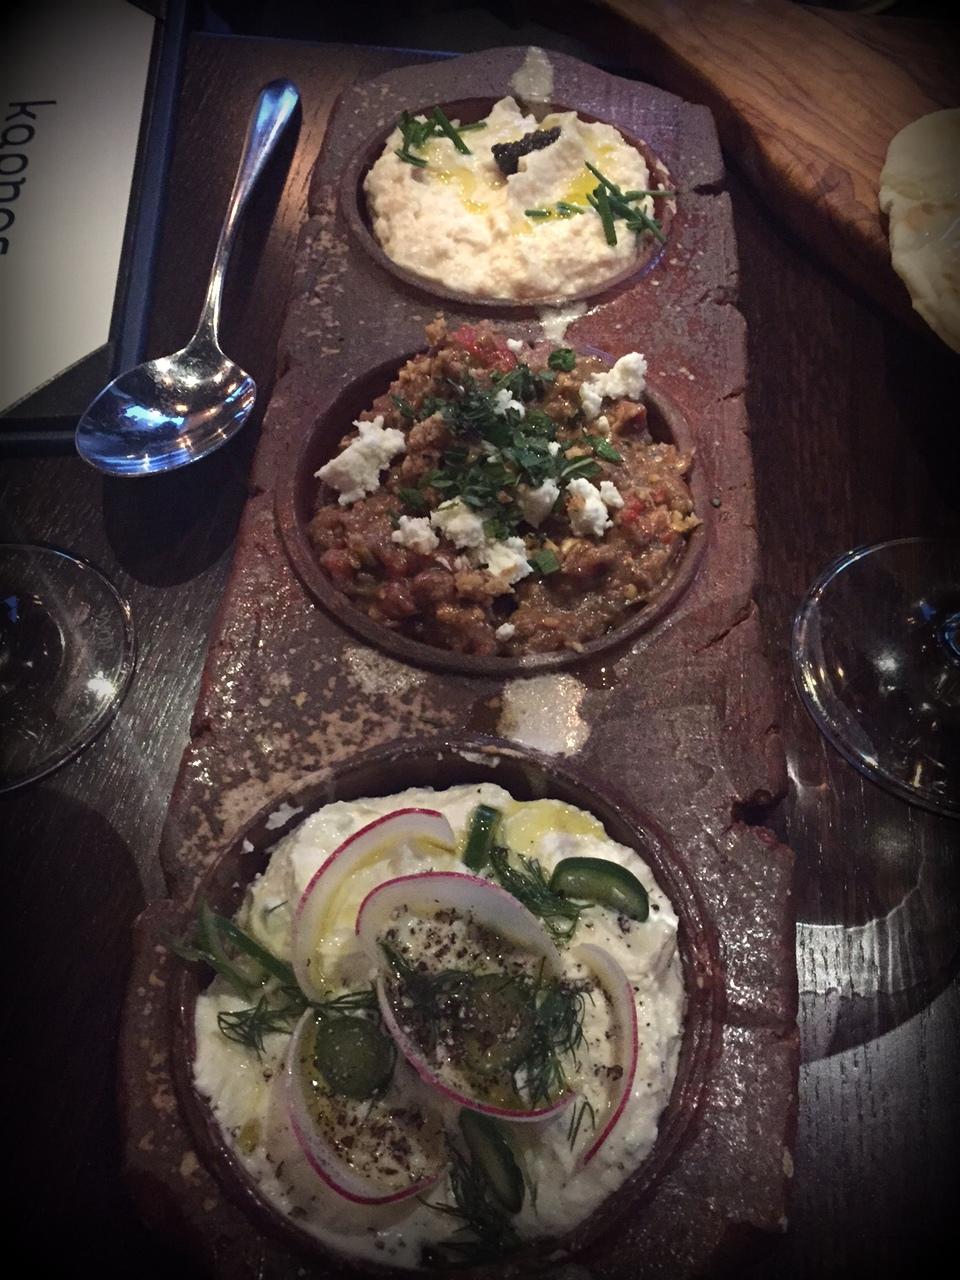 3 spreads: taramasalata made with carp roe, caviar and cauliflower;melitzanosalata (smoky eggplant, walnuts, feta and roasted sweet peppers); andtyrokaftari (feta, manouri, and grains of paradise)